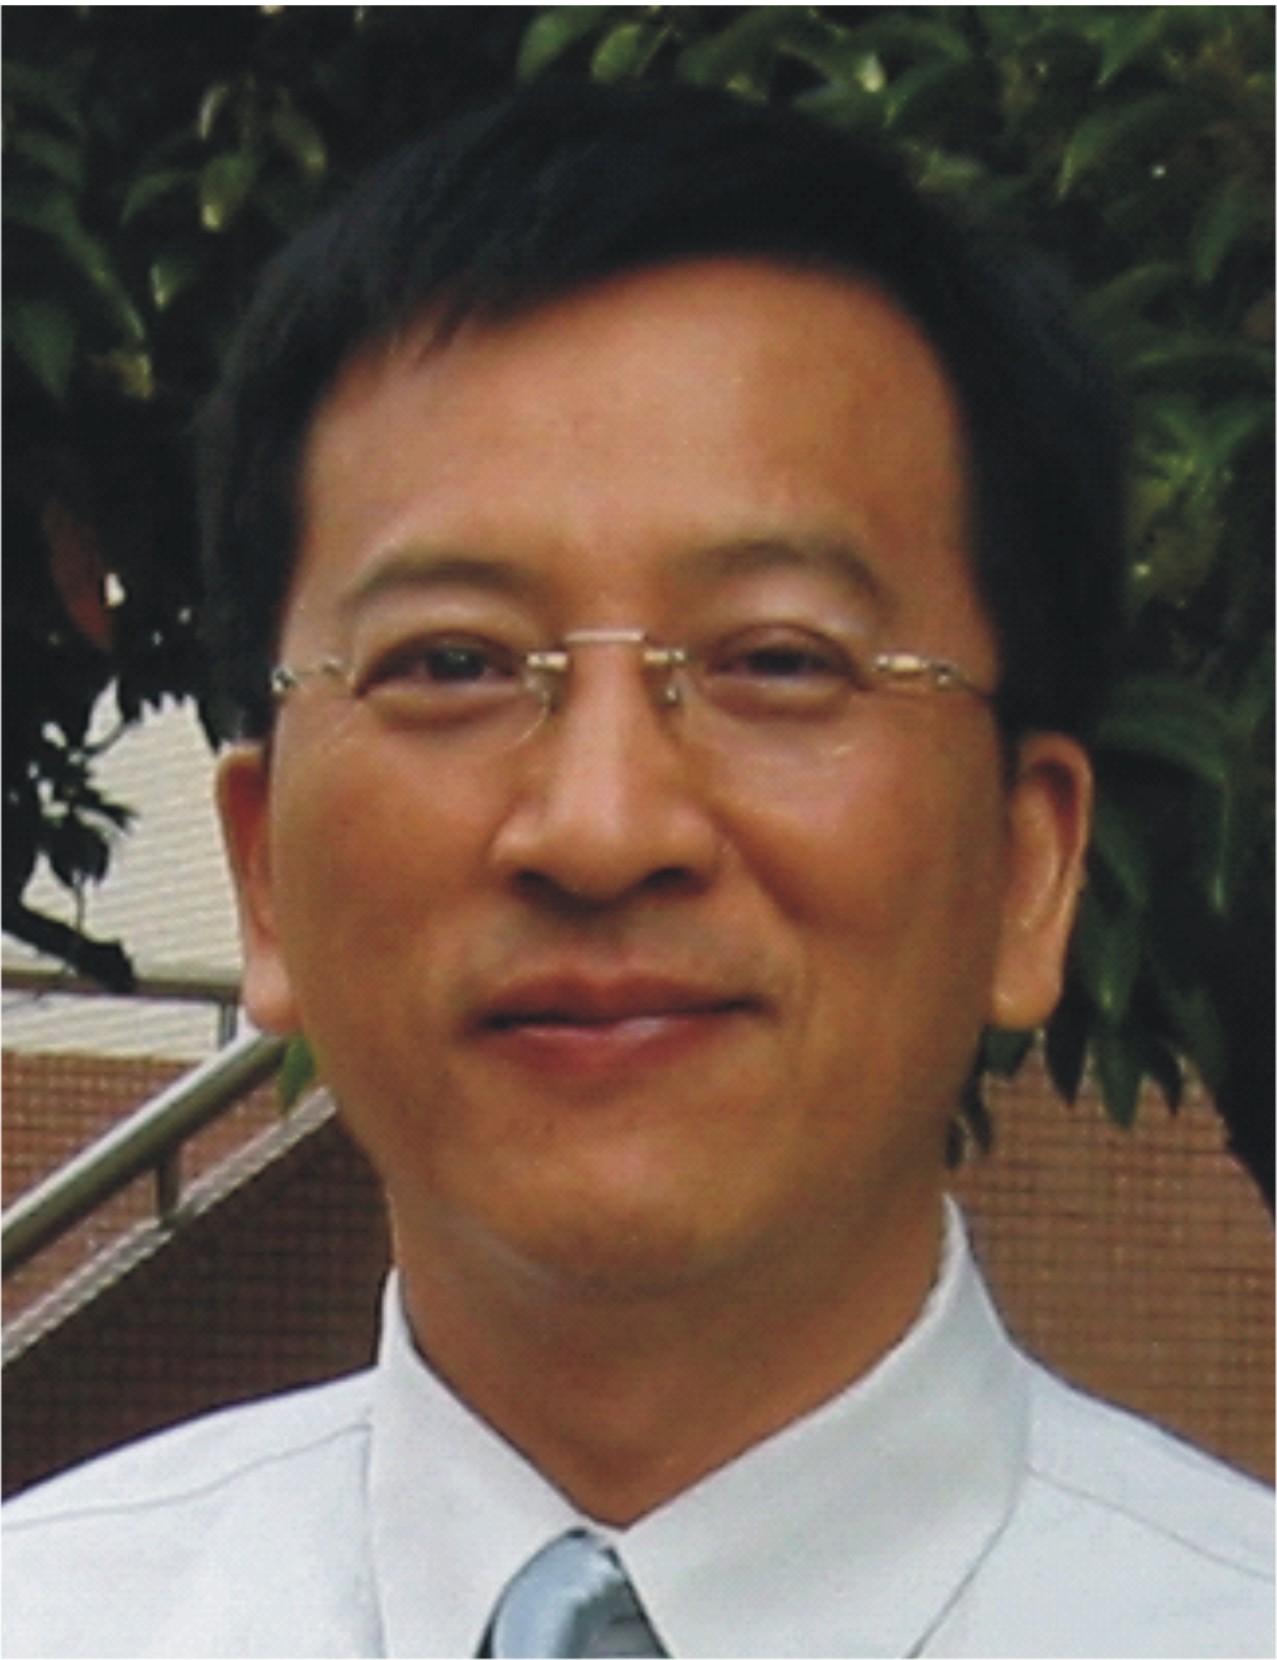 簡邦平 JIANN Bang-Ping